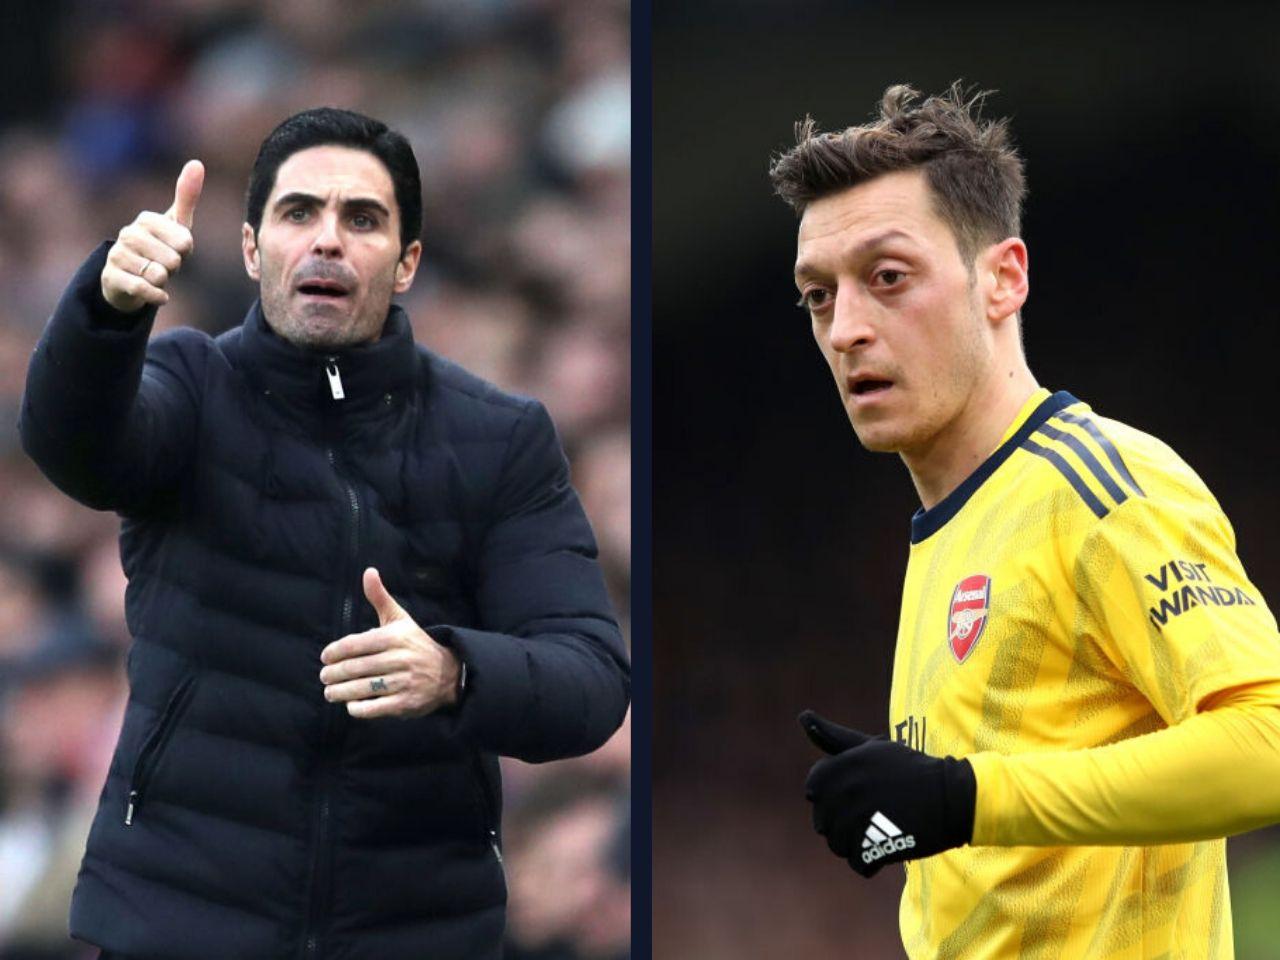 Mikel Arteta, Mesut Ozil, Arsenal, Premier League